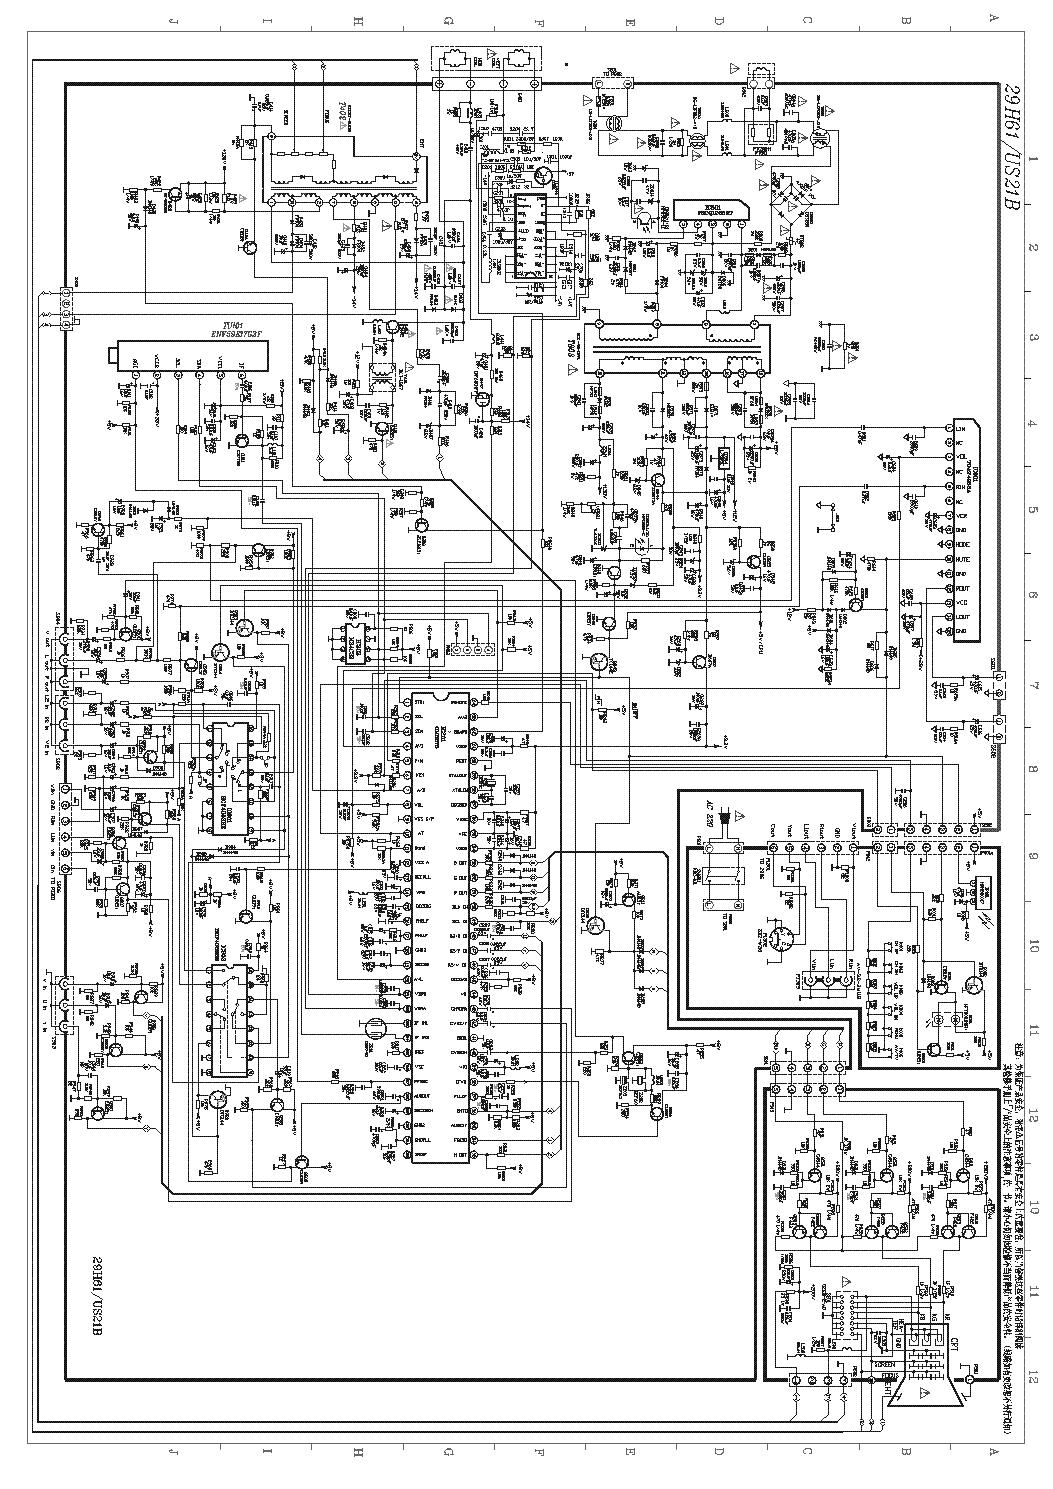 china tv circuit diagram la76931 circuit and schematics. Black Bedroom Furniture Sets. Home Design Ideas